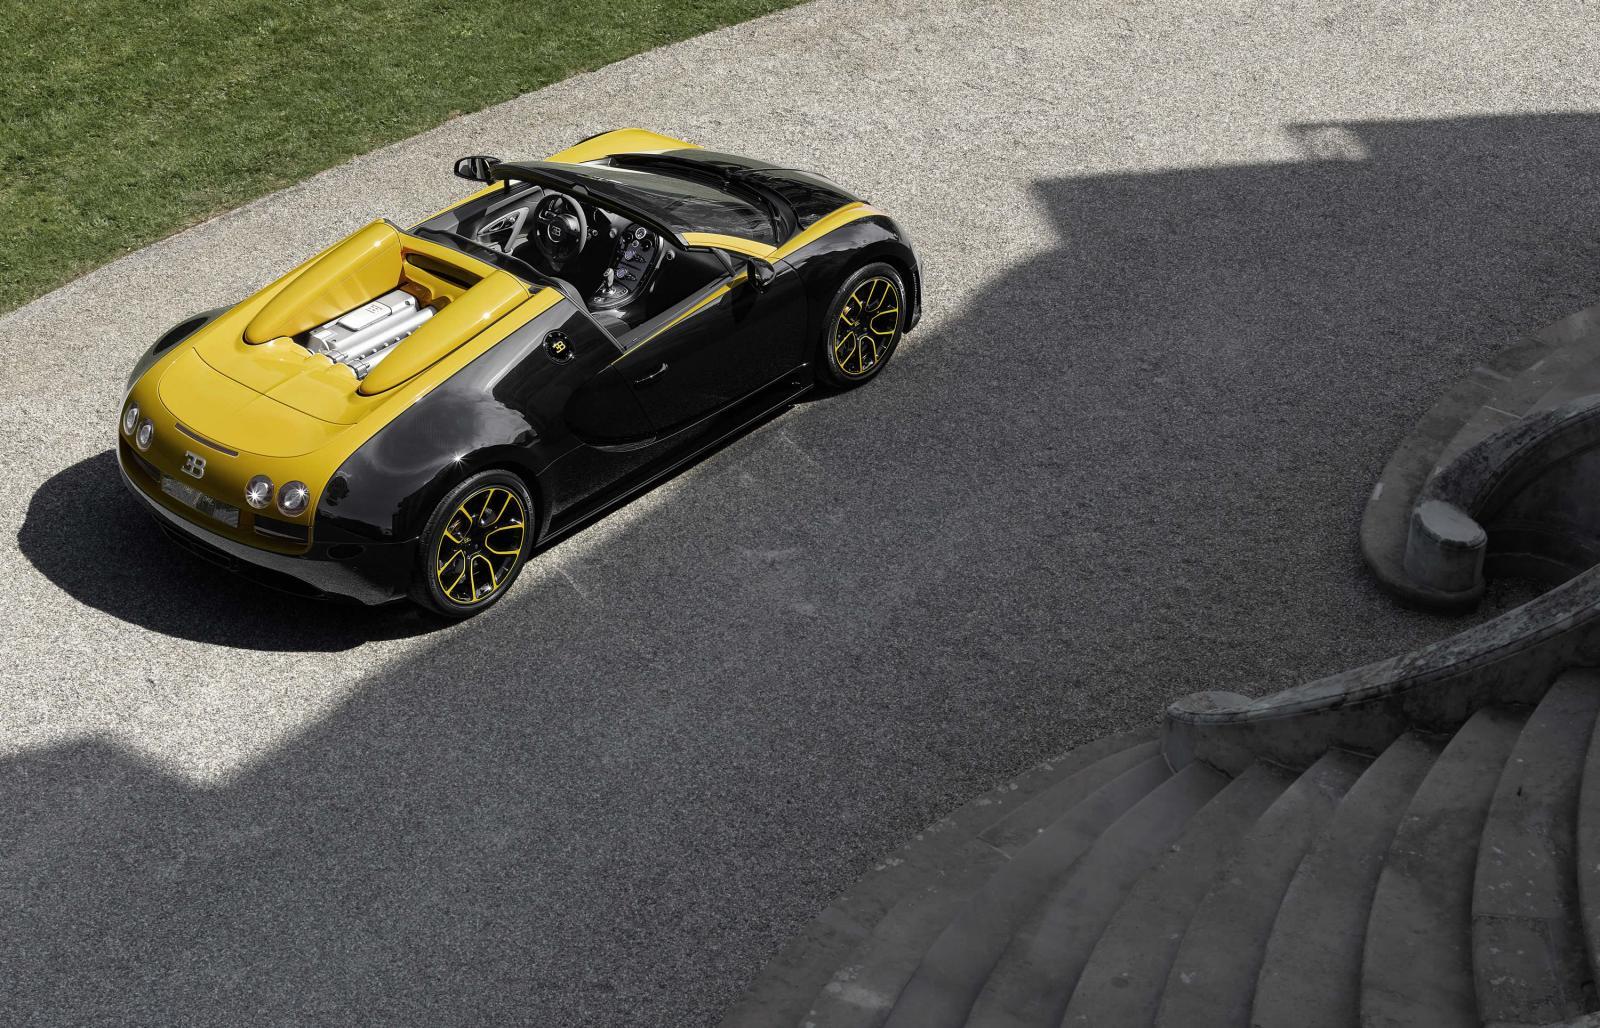 2015 bugatti veyron grand sport vitesse 1 of 1 car pictures. Black Bedroom Furniture Sets. Home Design Ideas